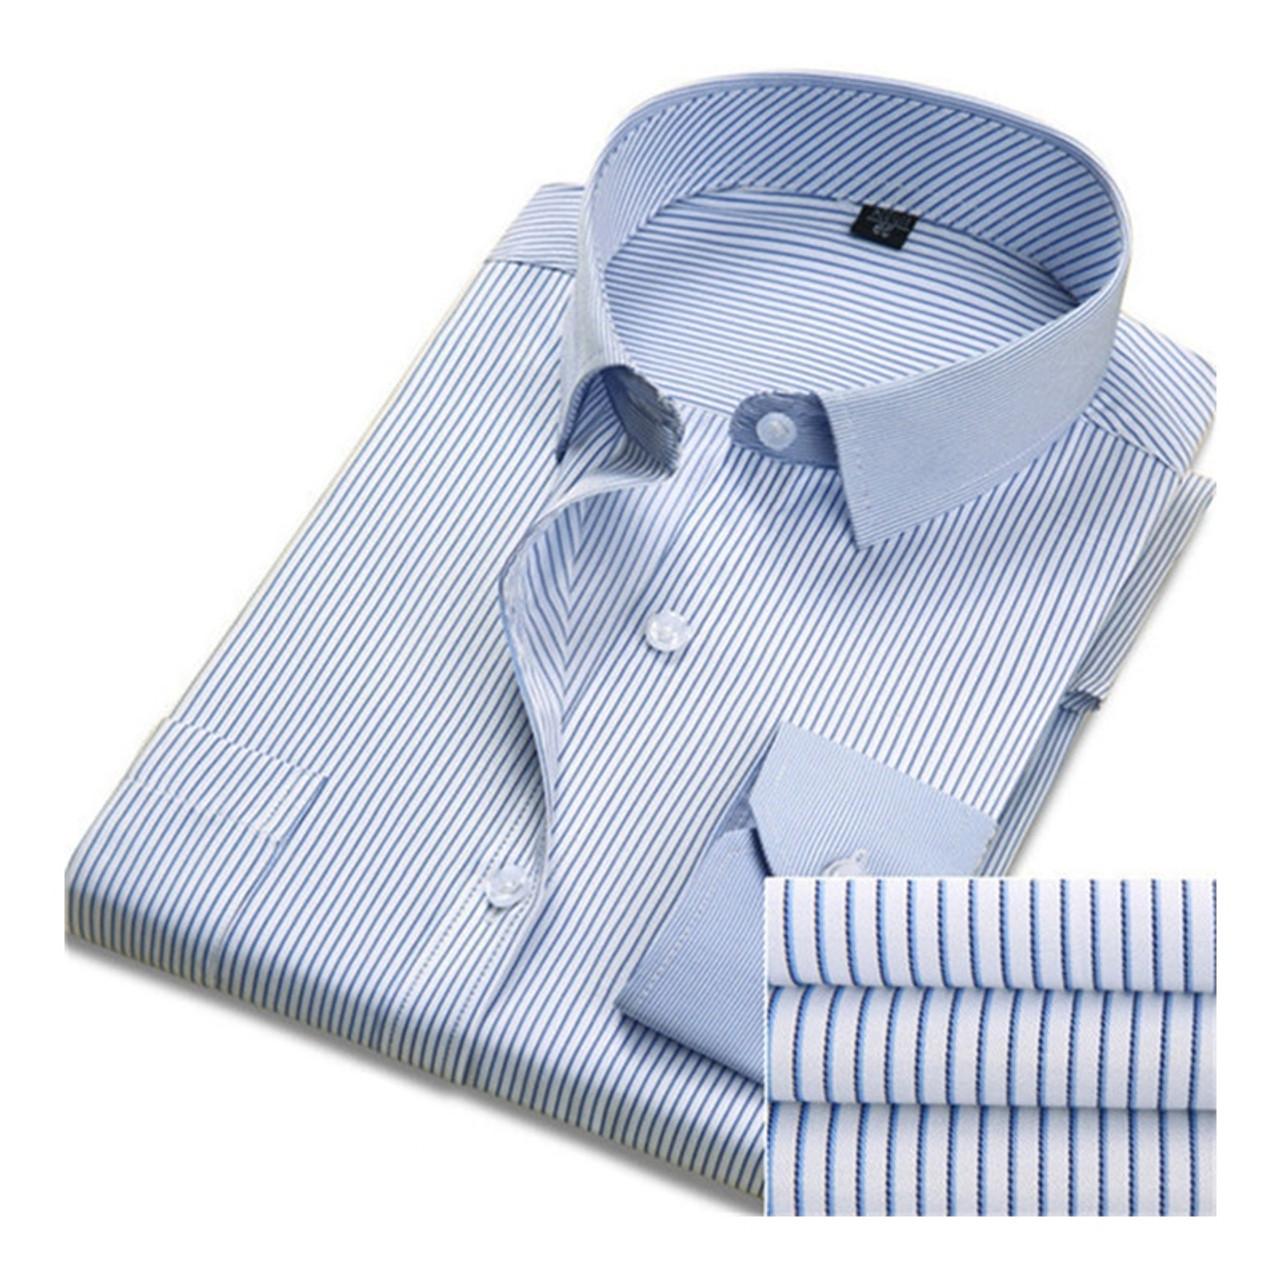 2080775a41e7b DAVYDAISY Hot Sale Men Shirt Long Sleeved Fashion Solid Striped Male Formal  Business Shirts Brand Clothing Dress Shirt Man DS016